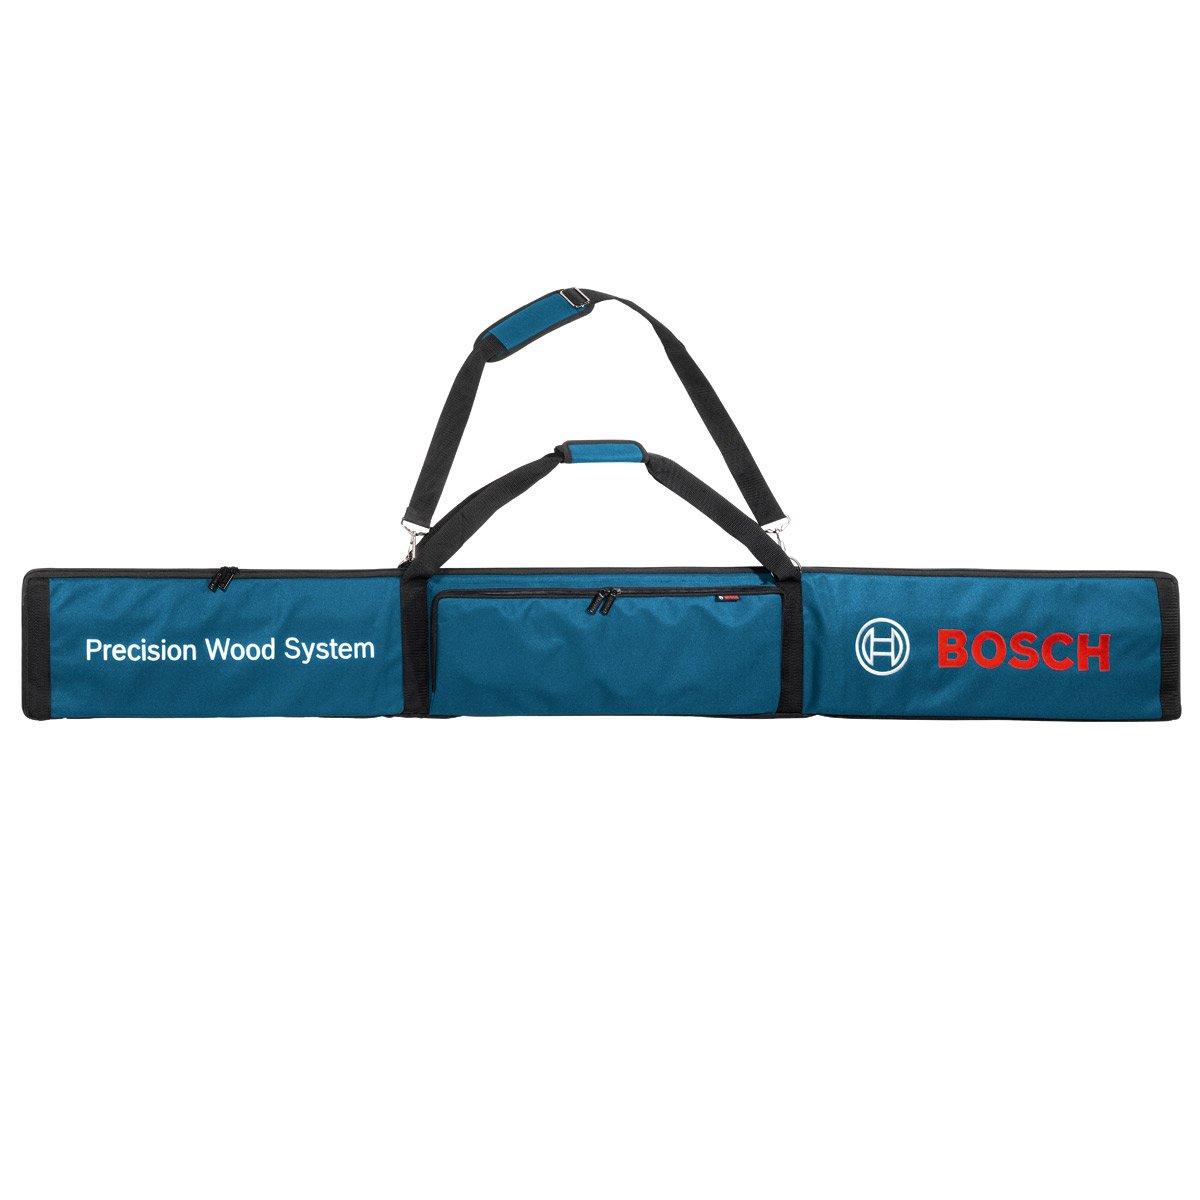 Bosch FSNBAG Guide Rail Carry Bag for FSN Rails up to 1.6m